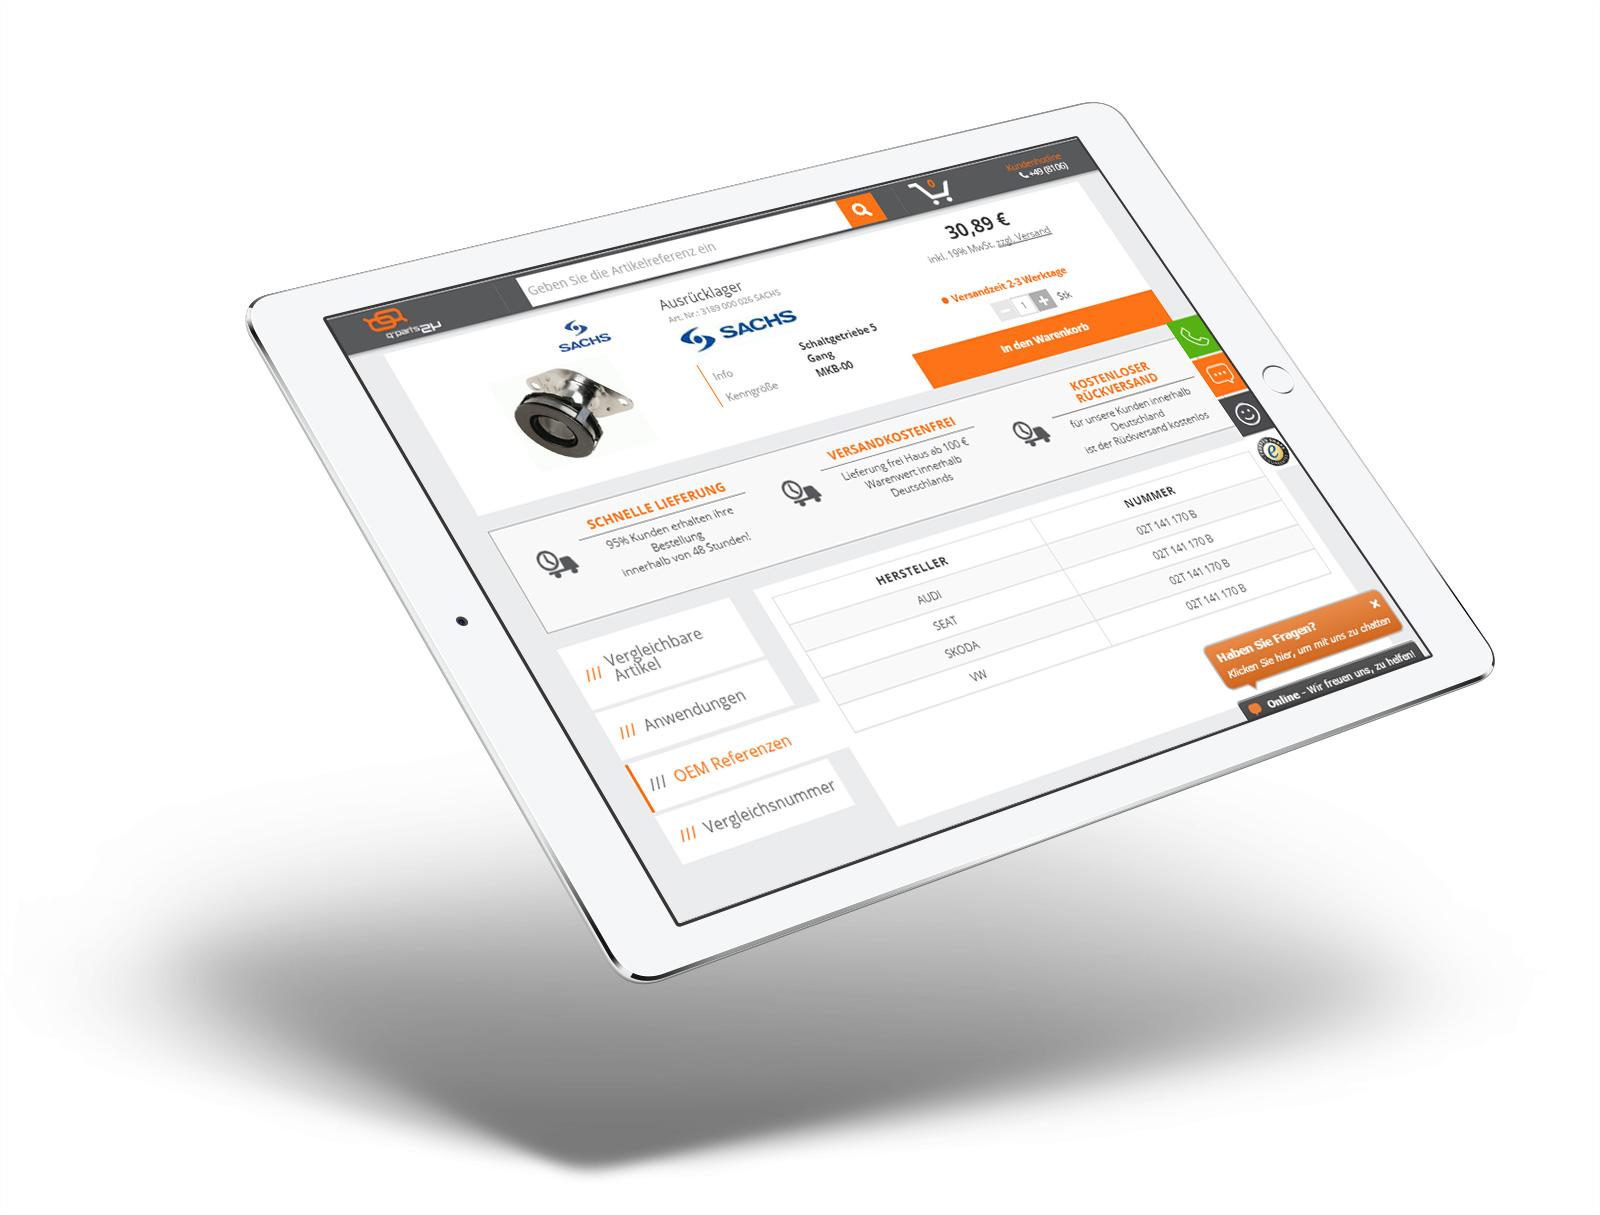 Qparts24 - widok sklepu internetowego na tablecie - qparts24